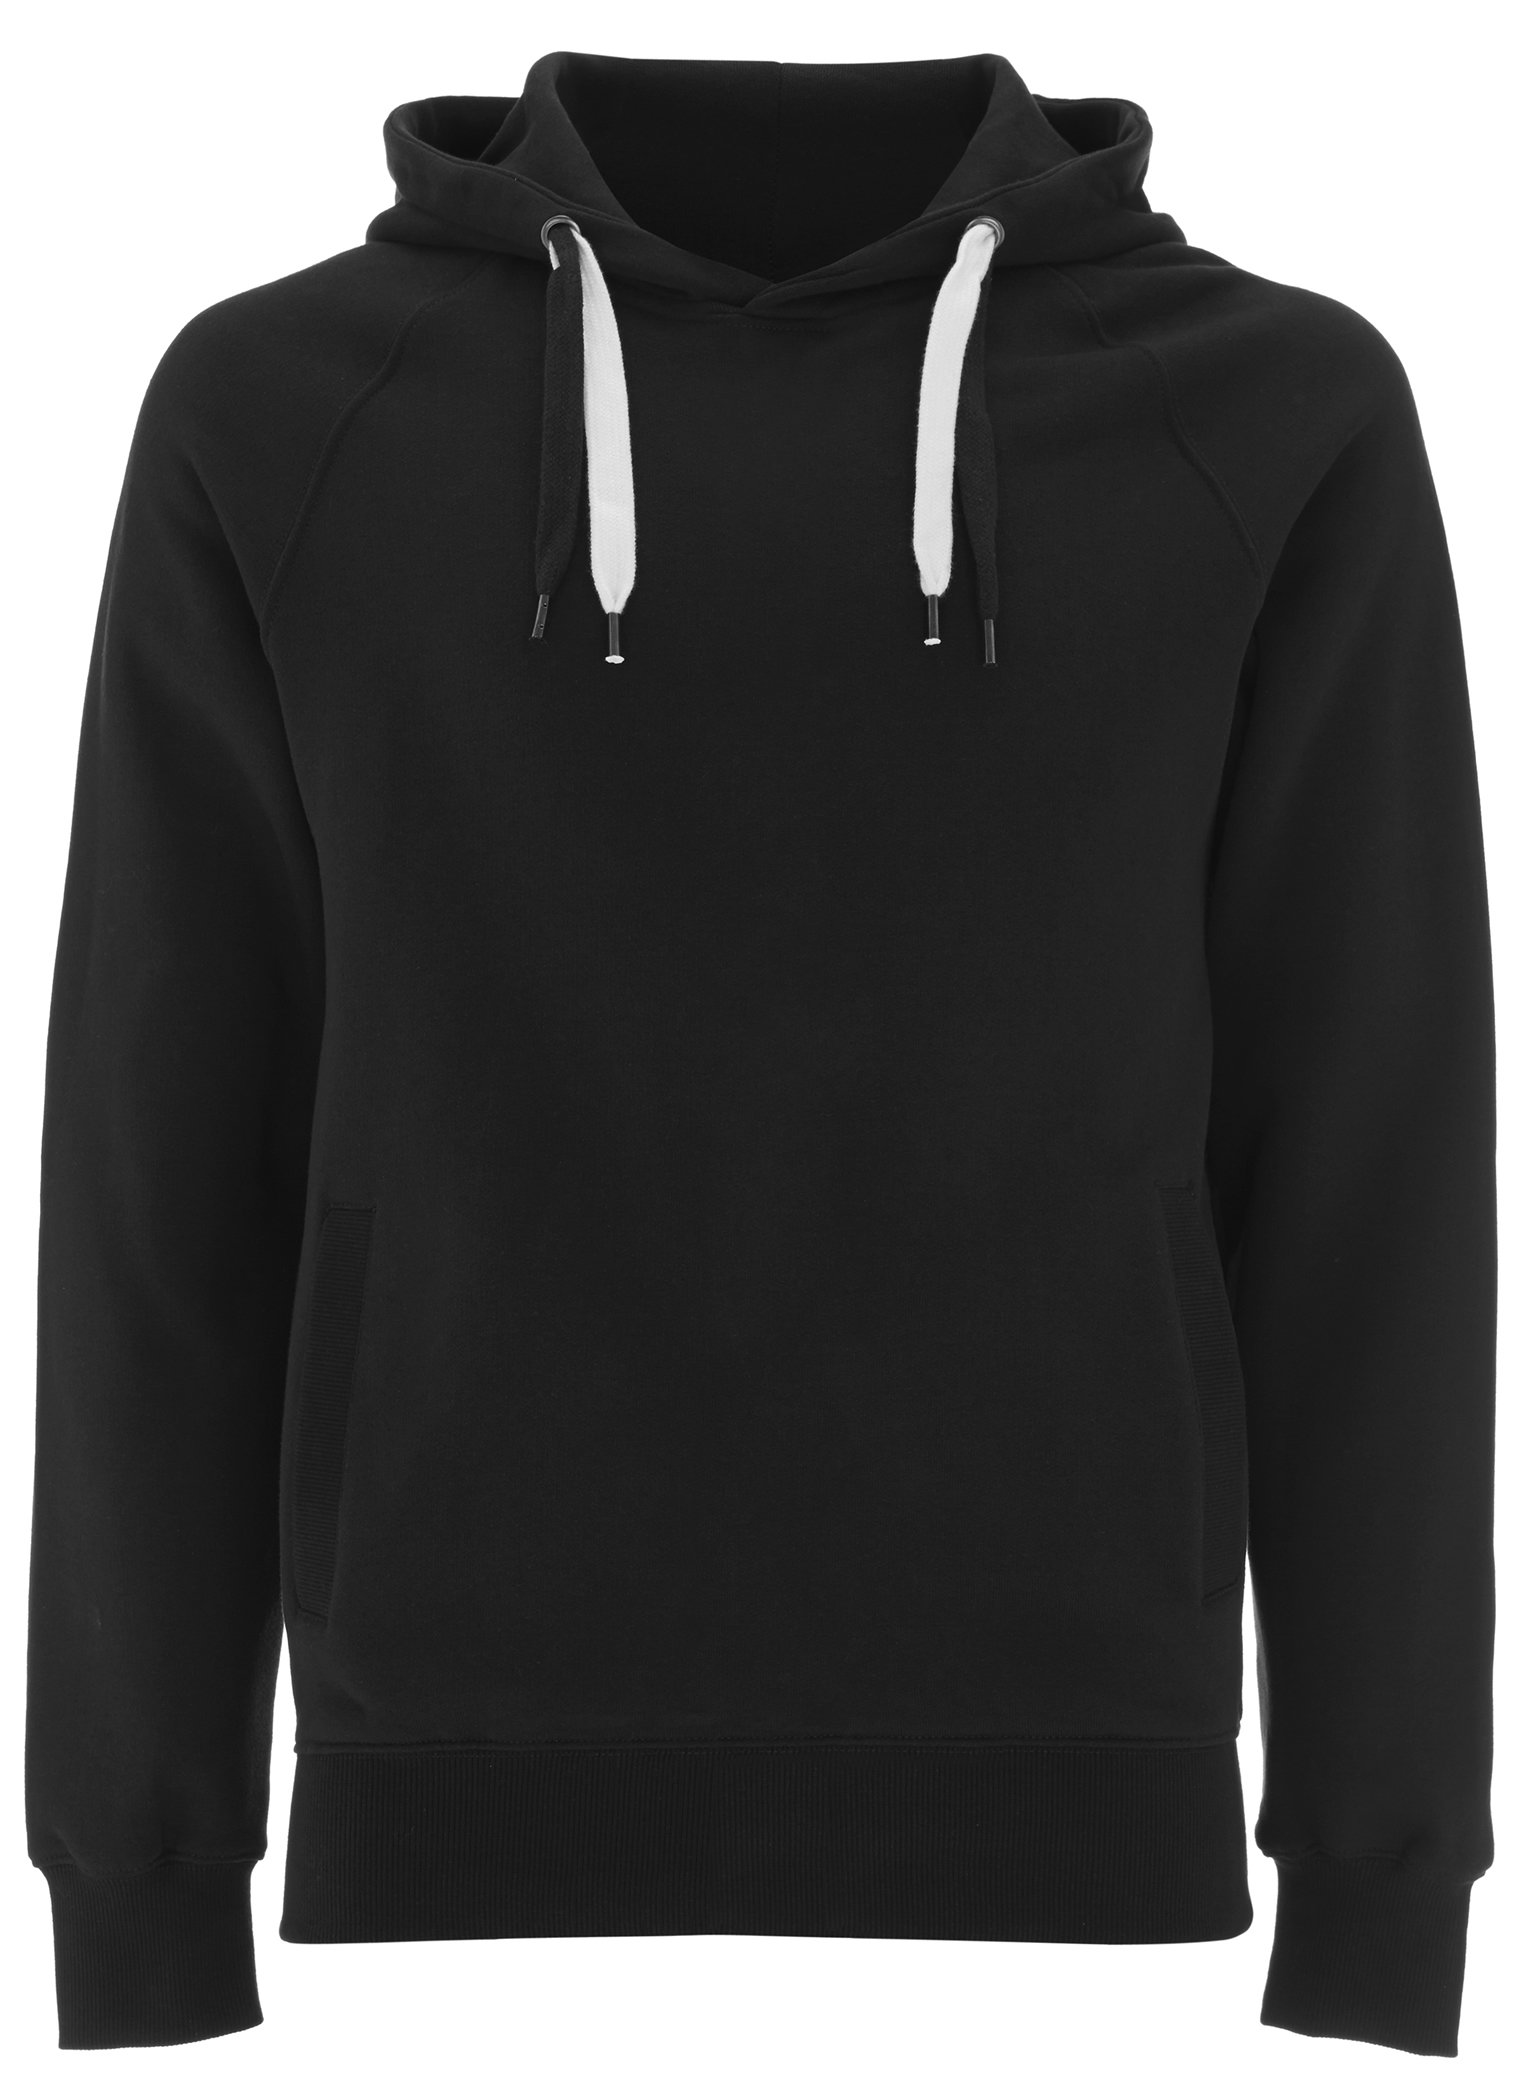 Black Hoodie for Women - X Large - XL - Womens Zipper Zip Up Cotton Sweatshirt